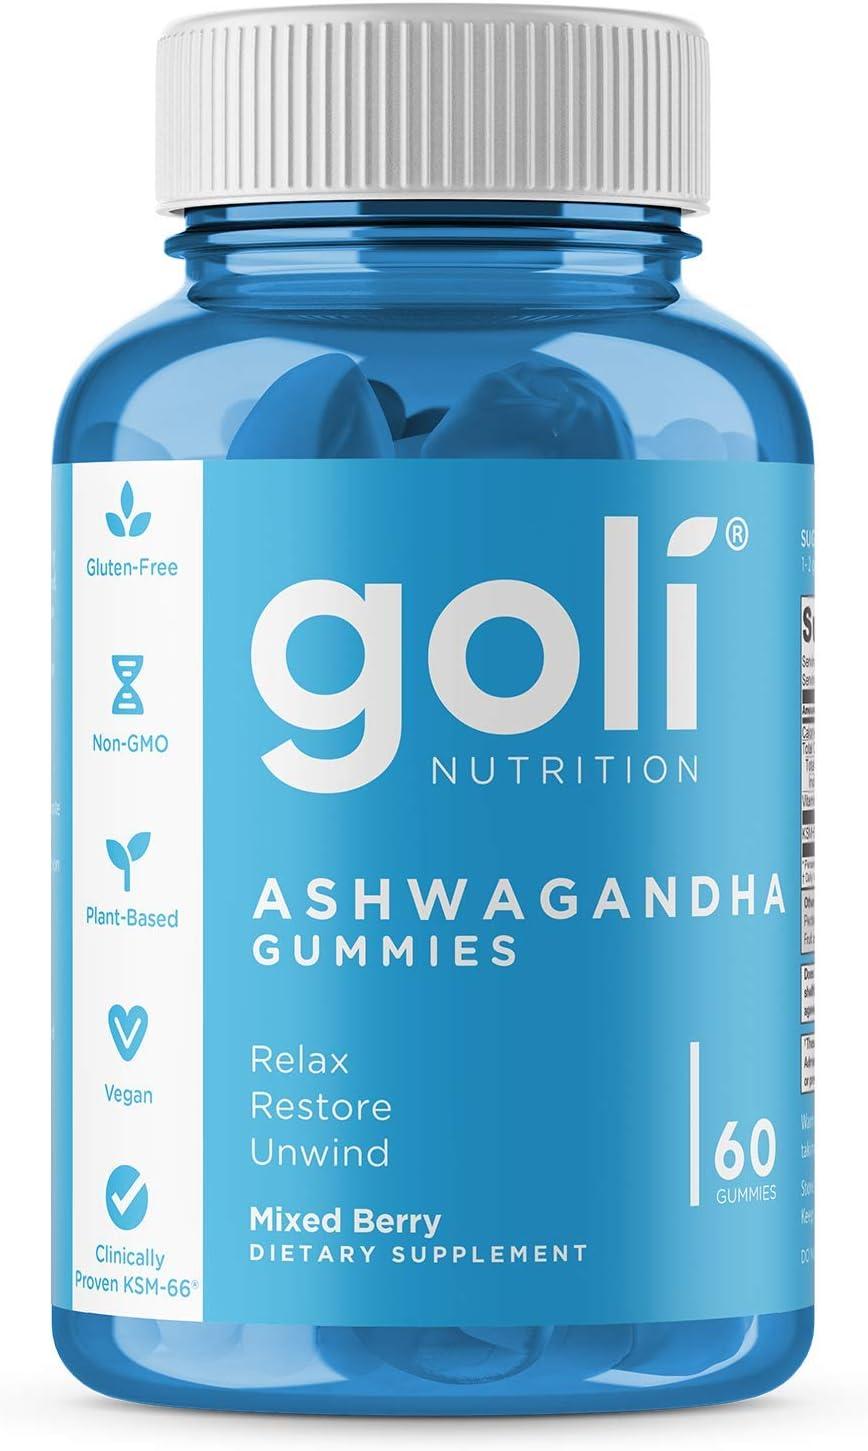 ASHWA Vitamin Gummy by Goli Nutrition - Ashwagandha and Vitamin D Gummies - Relax. Restore. Unwind. (Mixed Berry, KSM-66, Vegan, Plant Based, Non-GMO, Gluten-Free & Gelatin Free - 60 Count)